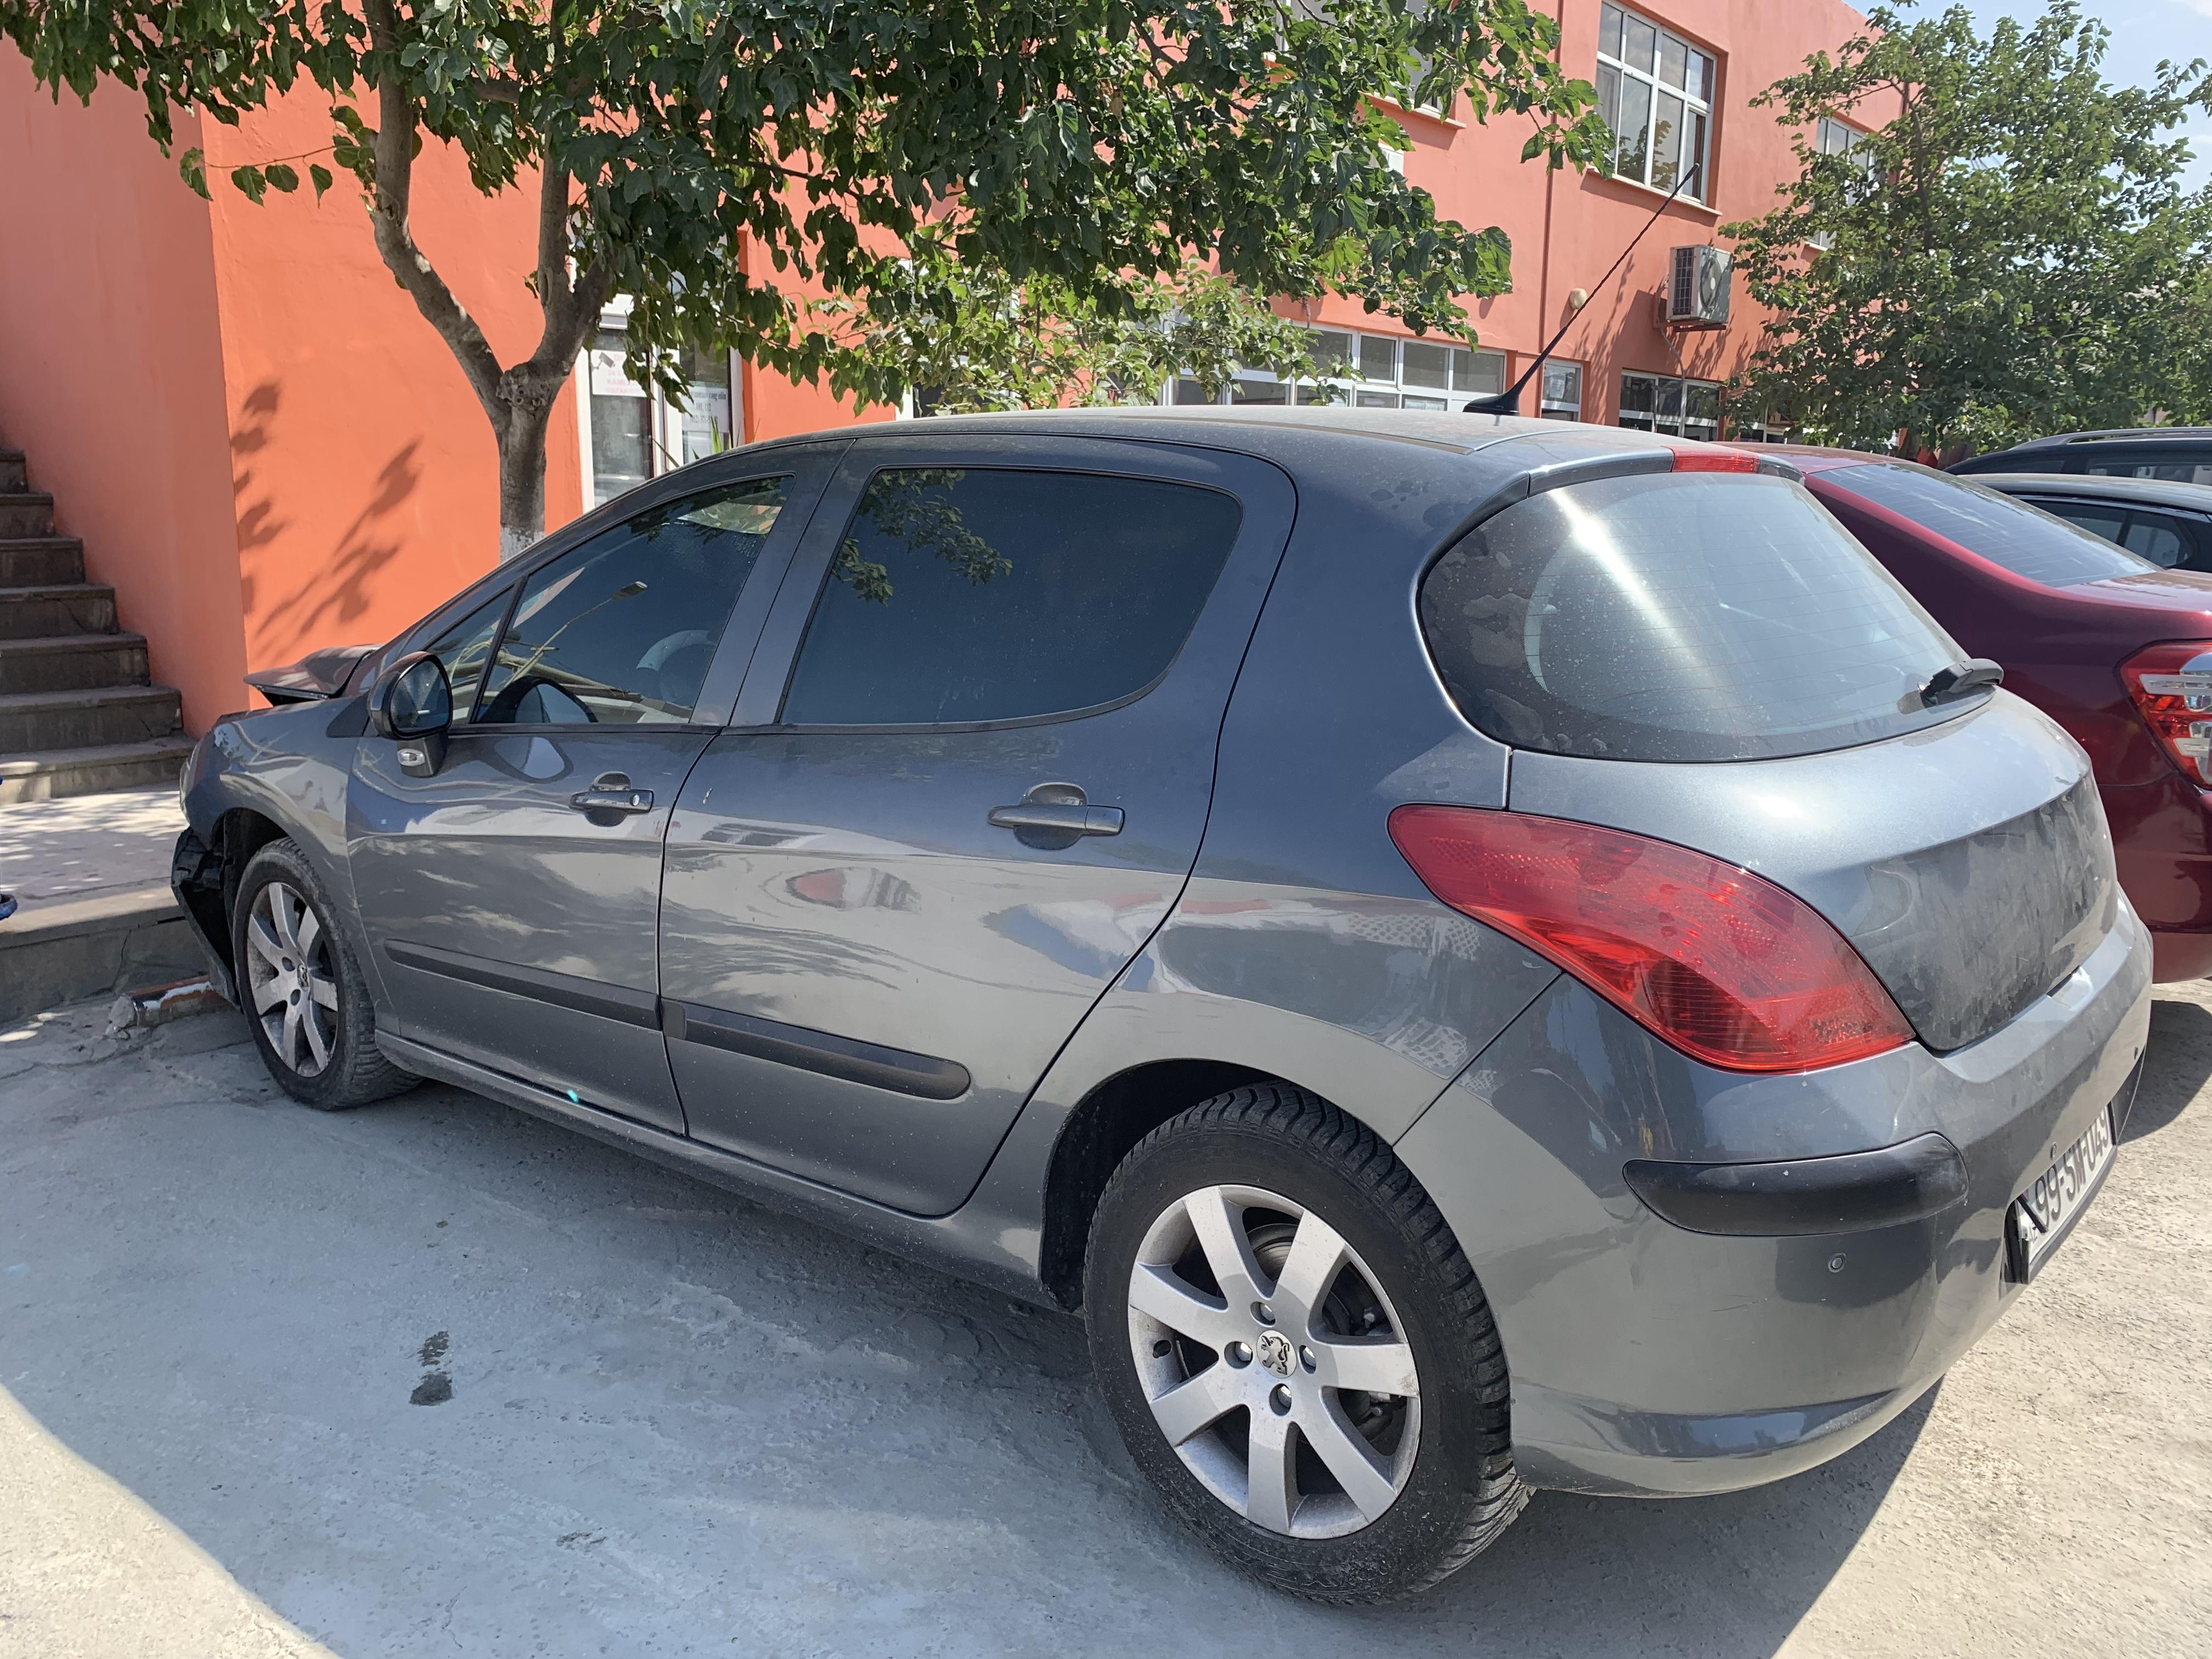 Peugeot 308 1.6(lt) 2009 İkinci əl  $3000